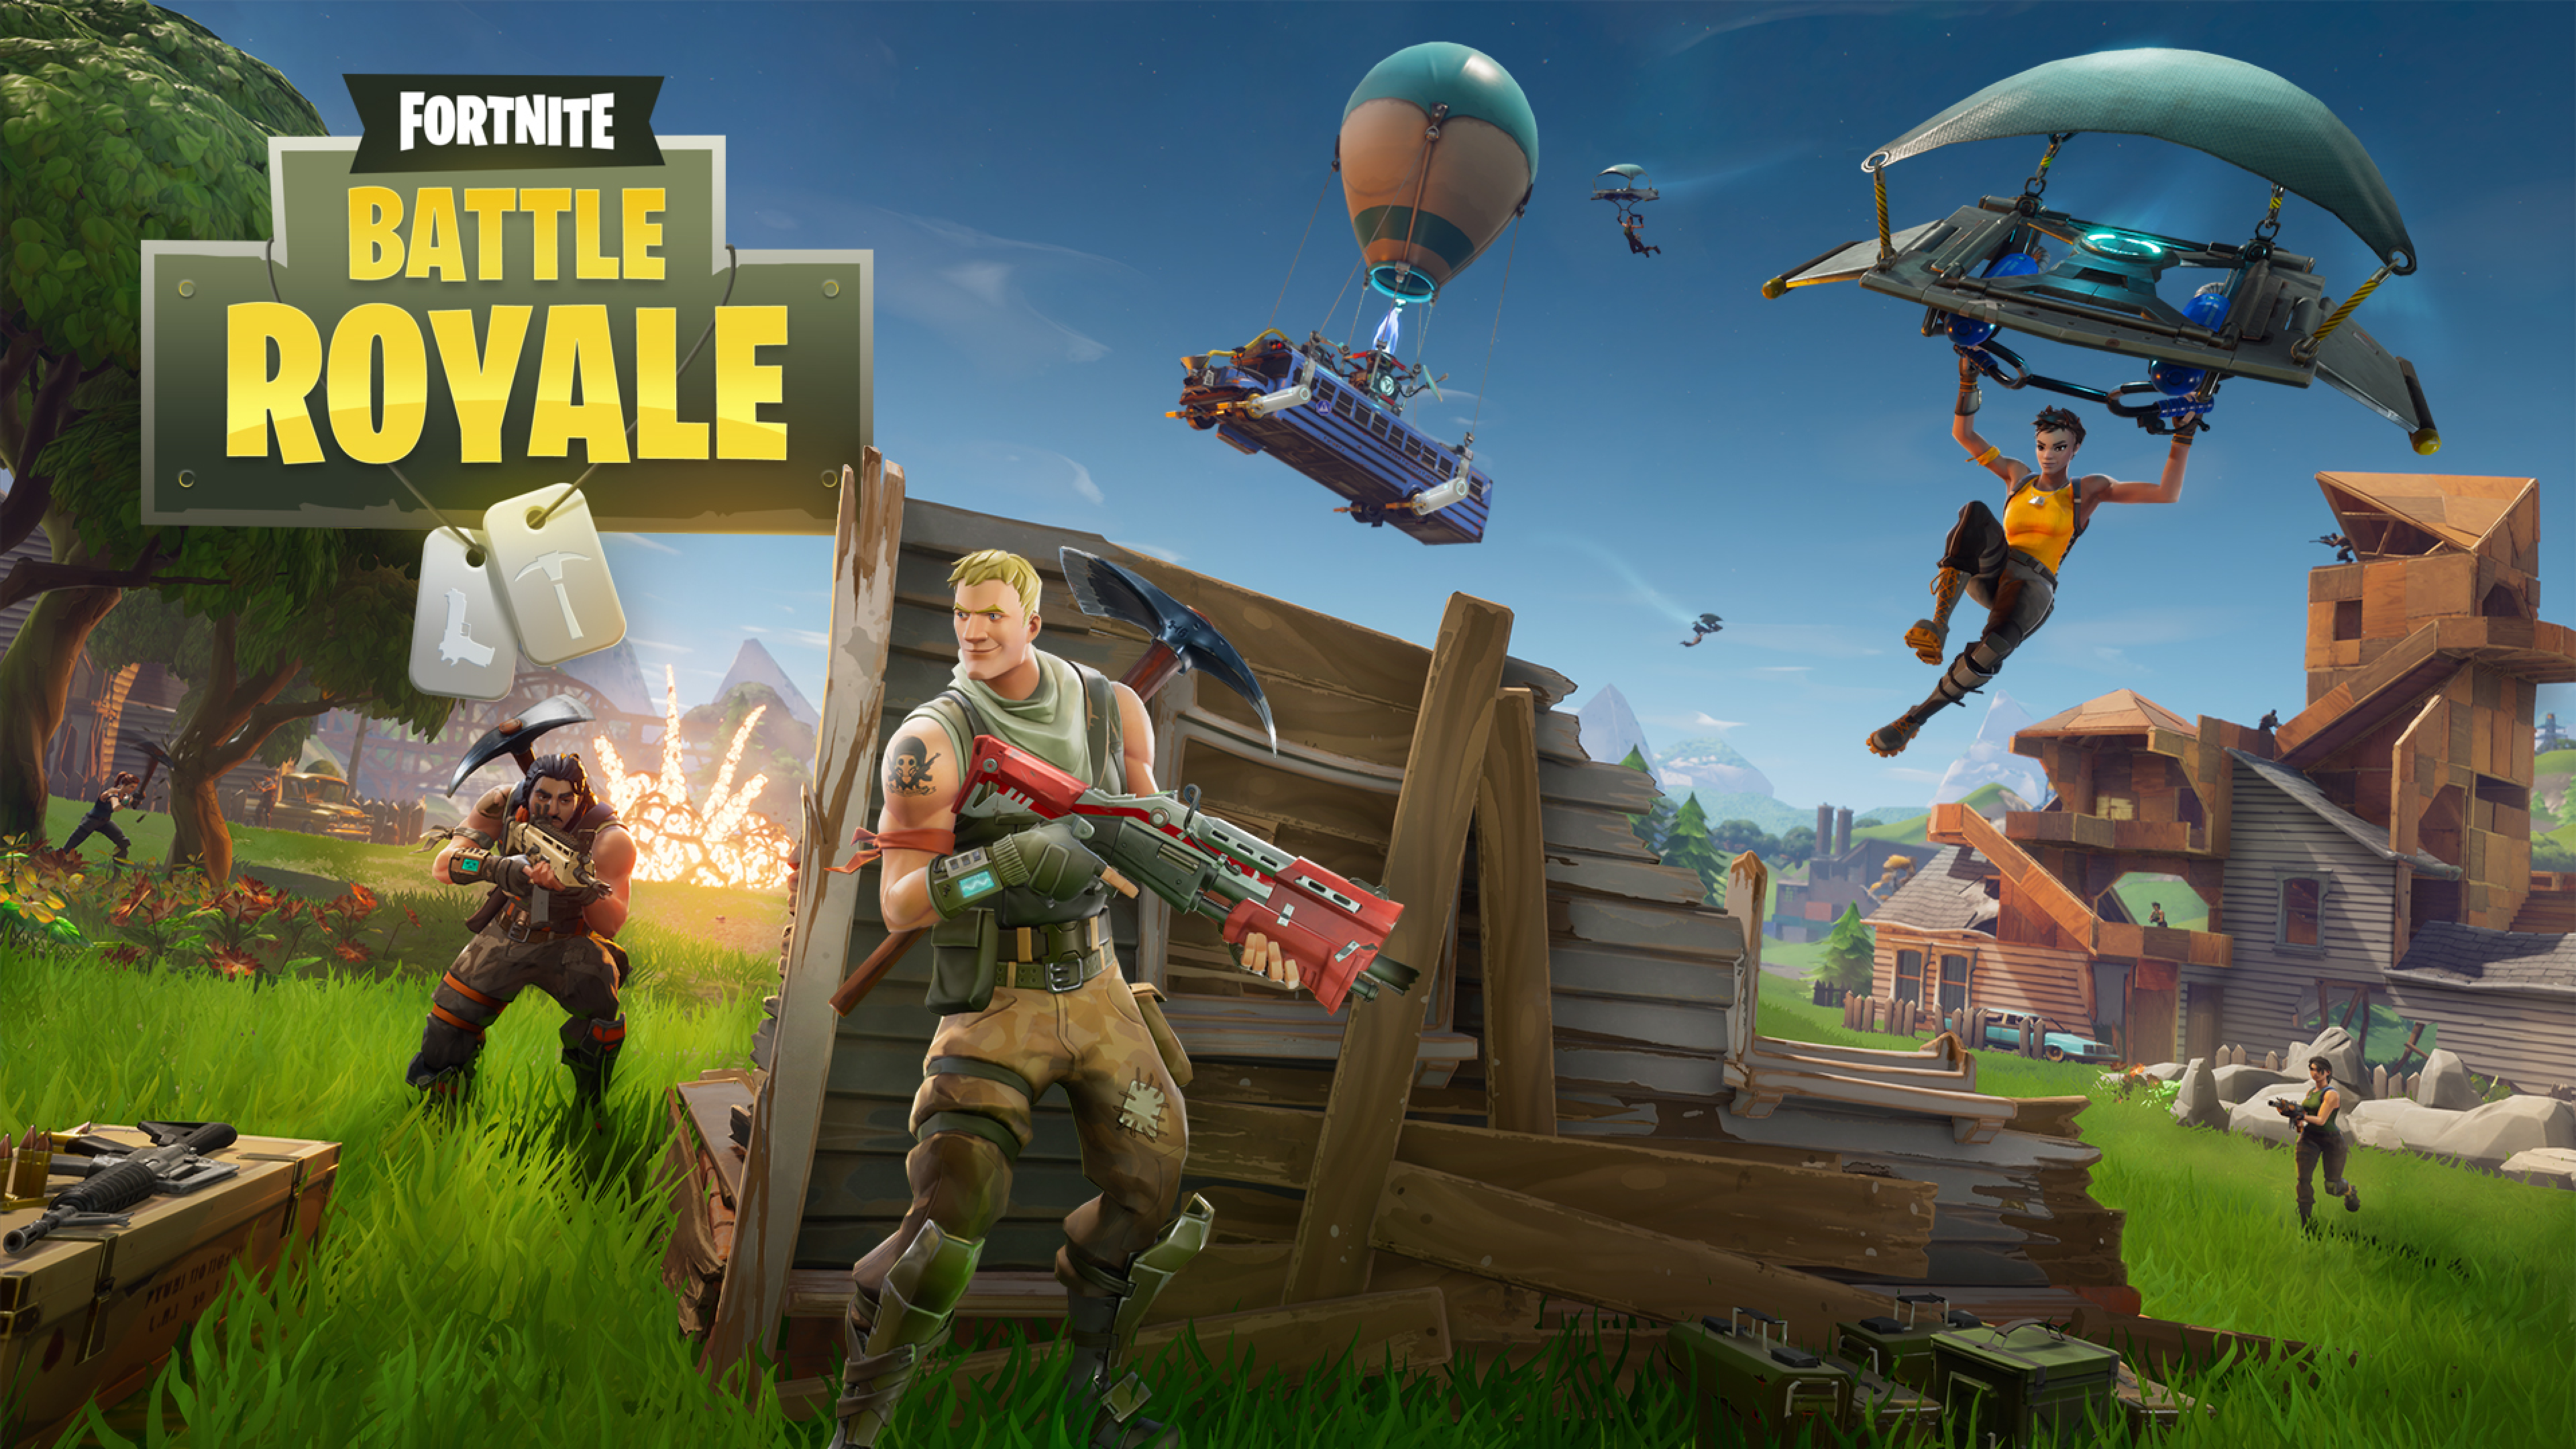 Download Fortnite Battle Royale 3840x2160 Resolution, Full HD Wallpaper